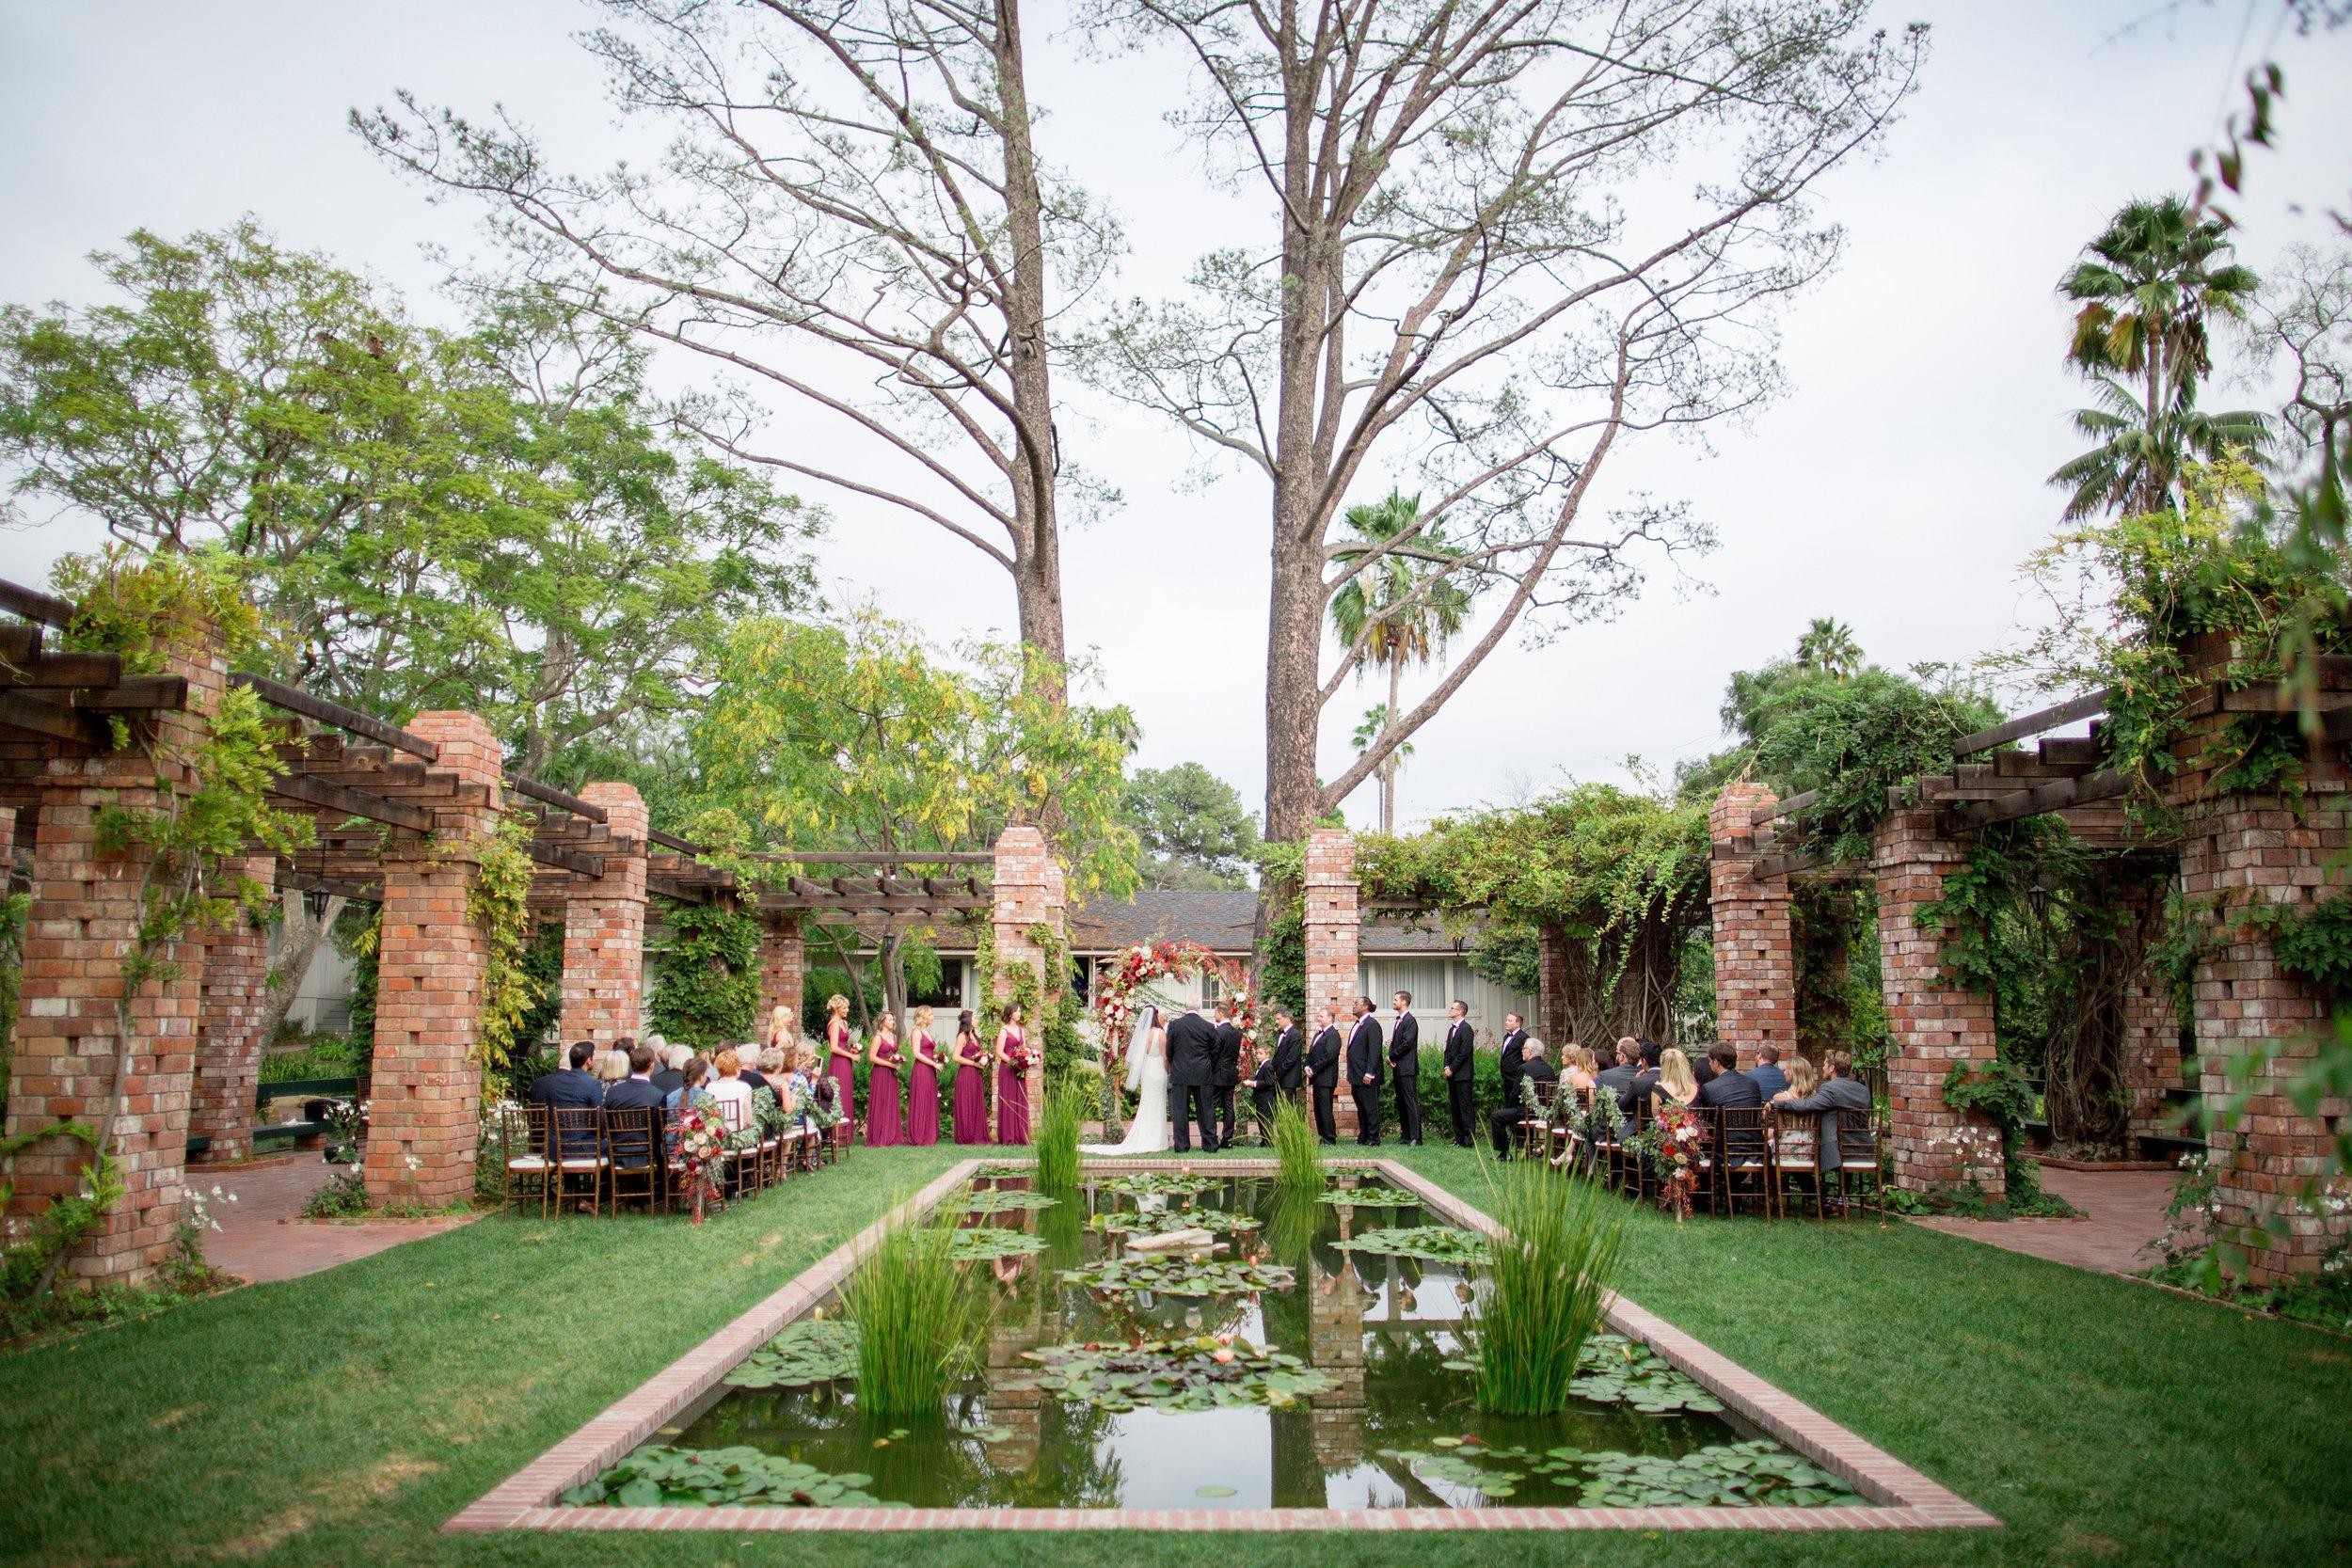 alegria-by-design-wedding-planner-coordinator-event-design-red-el-encanto-resort-lily-pond-arch-lantern (8).JPG